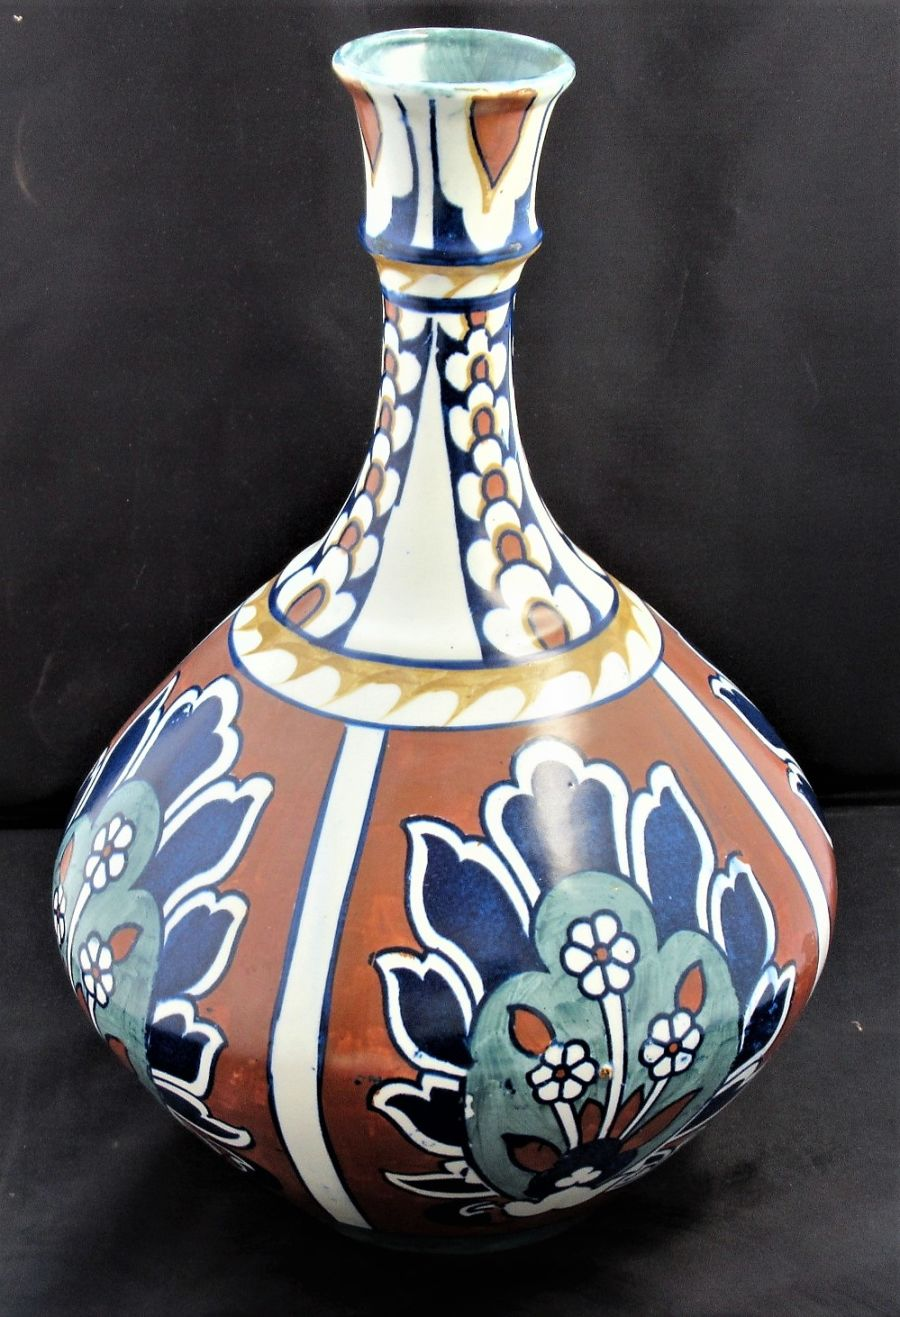 Large Frederick Rhead Bursley Ware Bagdad vase 1920-1925, Iznik/Persian pattern